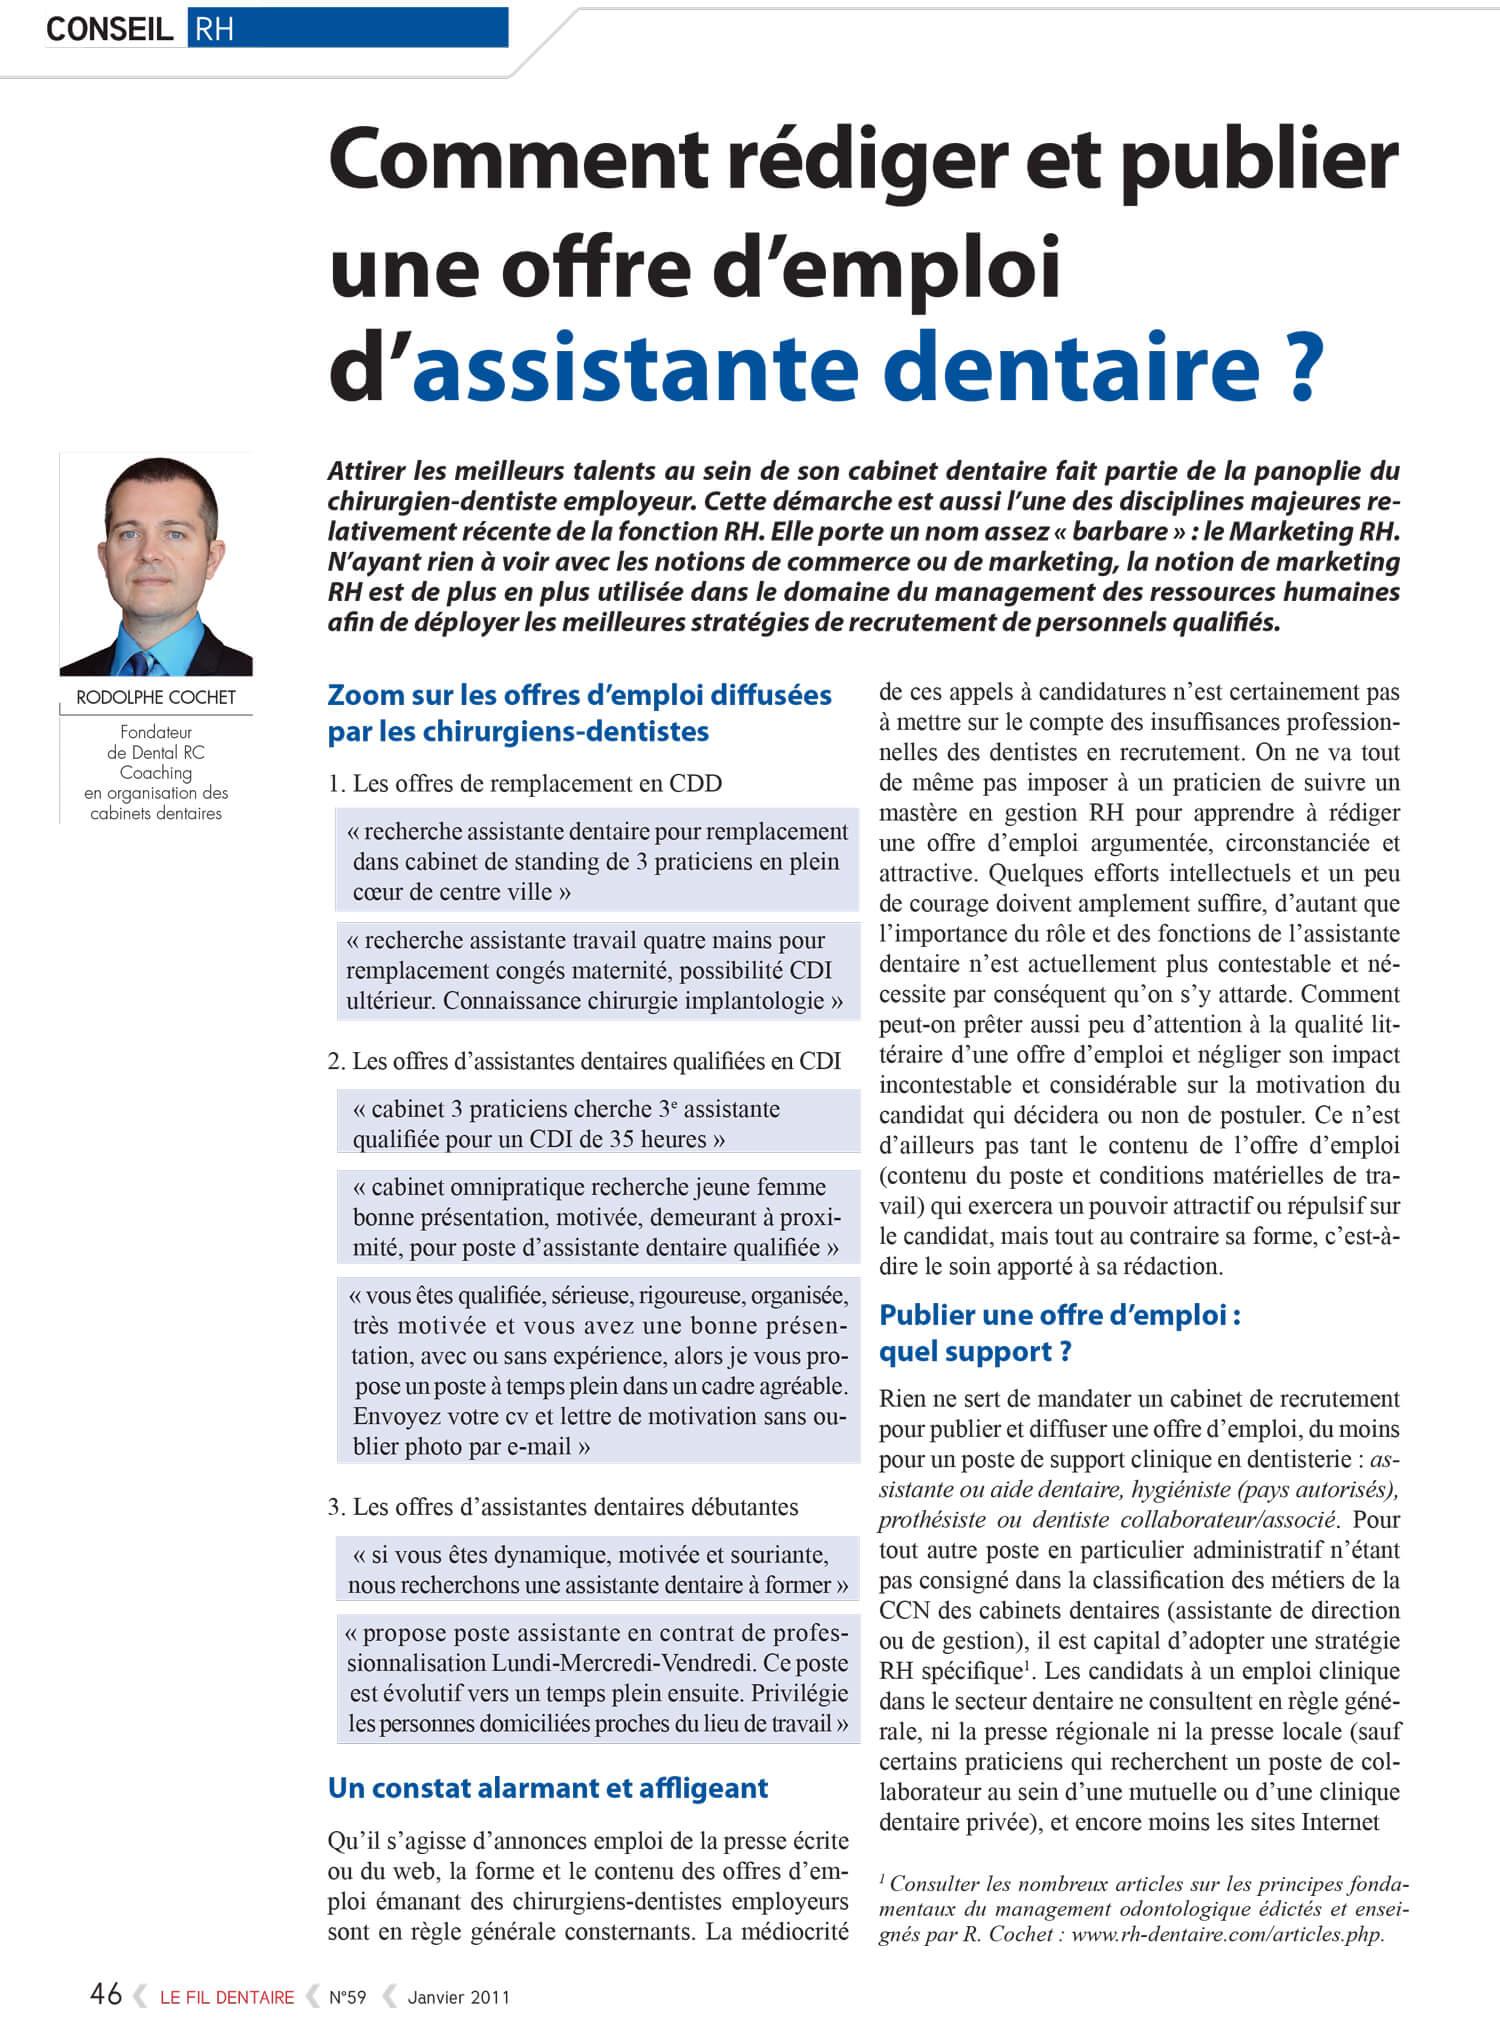 rediger-publier-offre-emploi-site-assistante-dentaire-rodolphe-cochet-dentalemploi.jpg